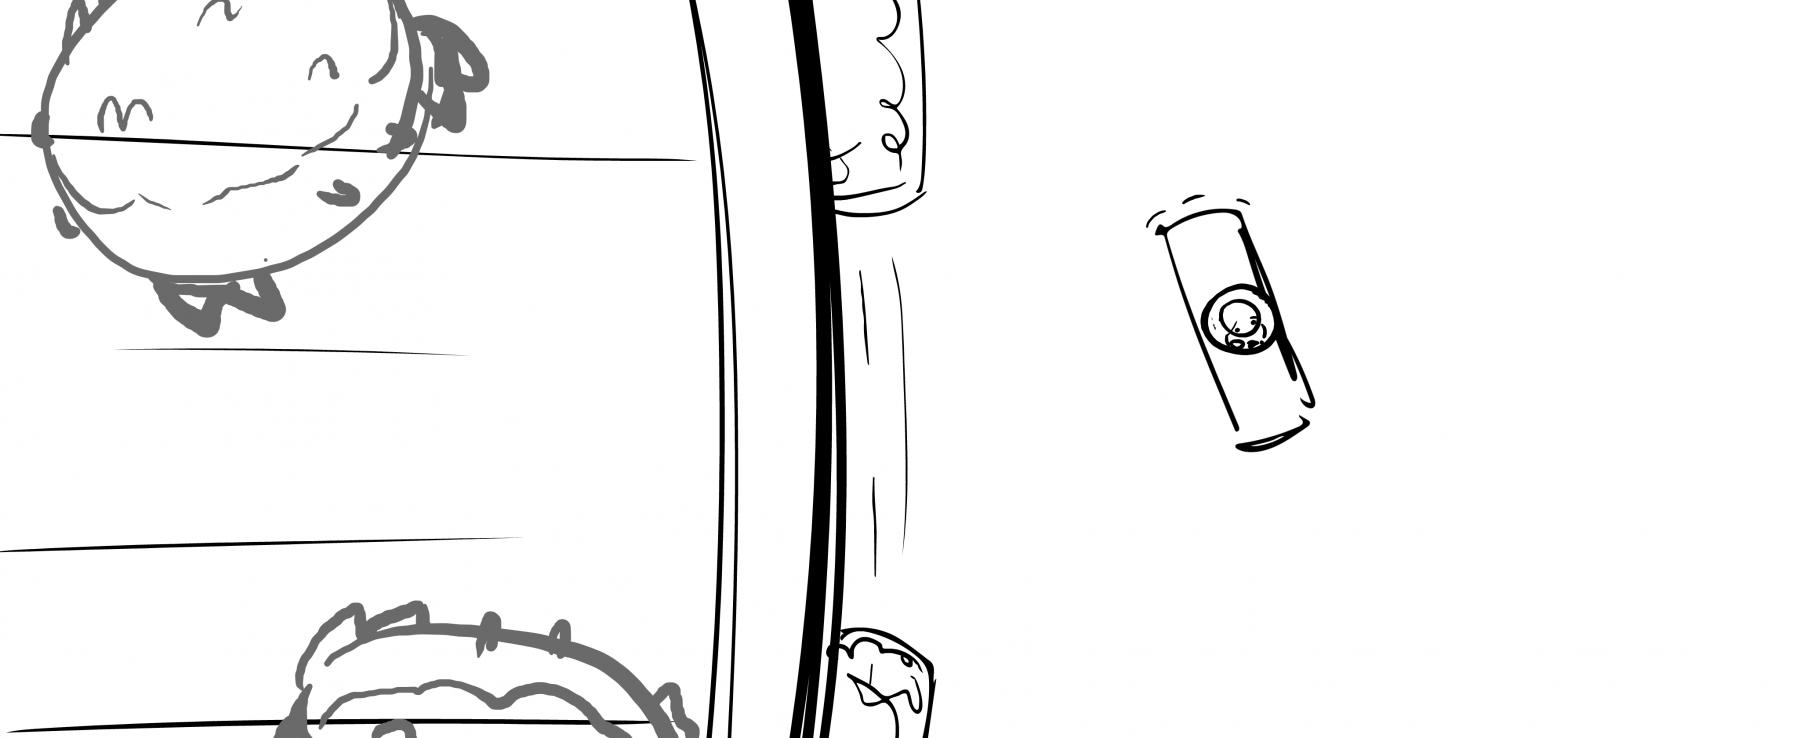 Nut-Thumbnail-Rough-Board00336